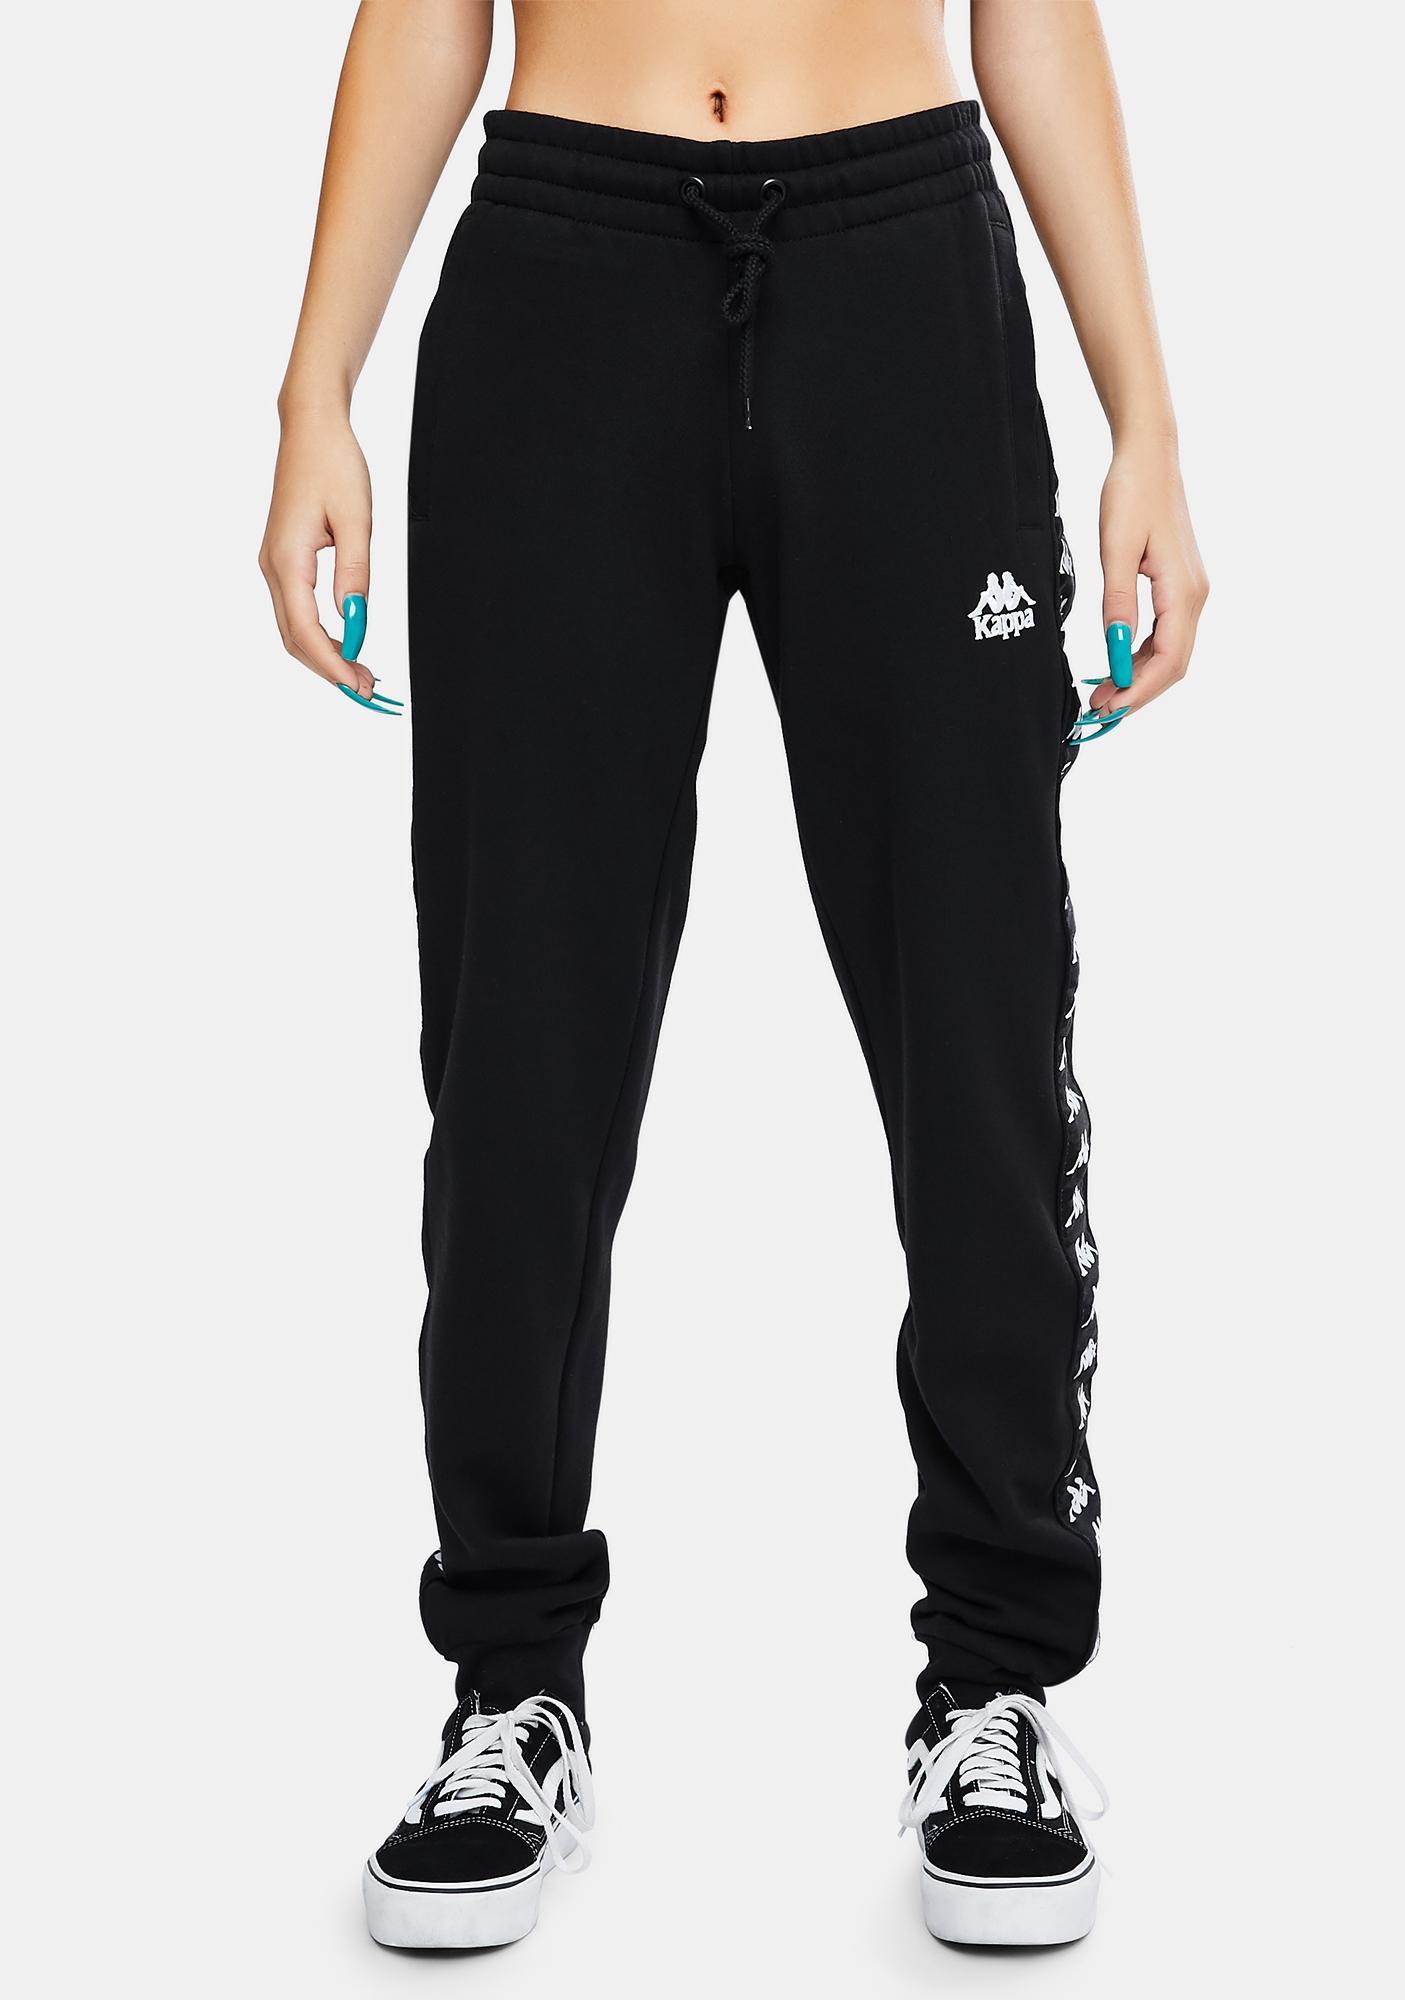 Kappa 222 Banda Barnu 2 Black Track Pants